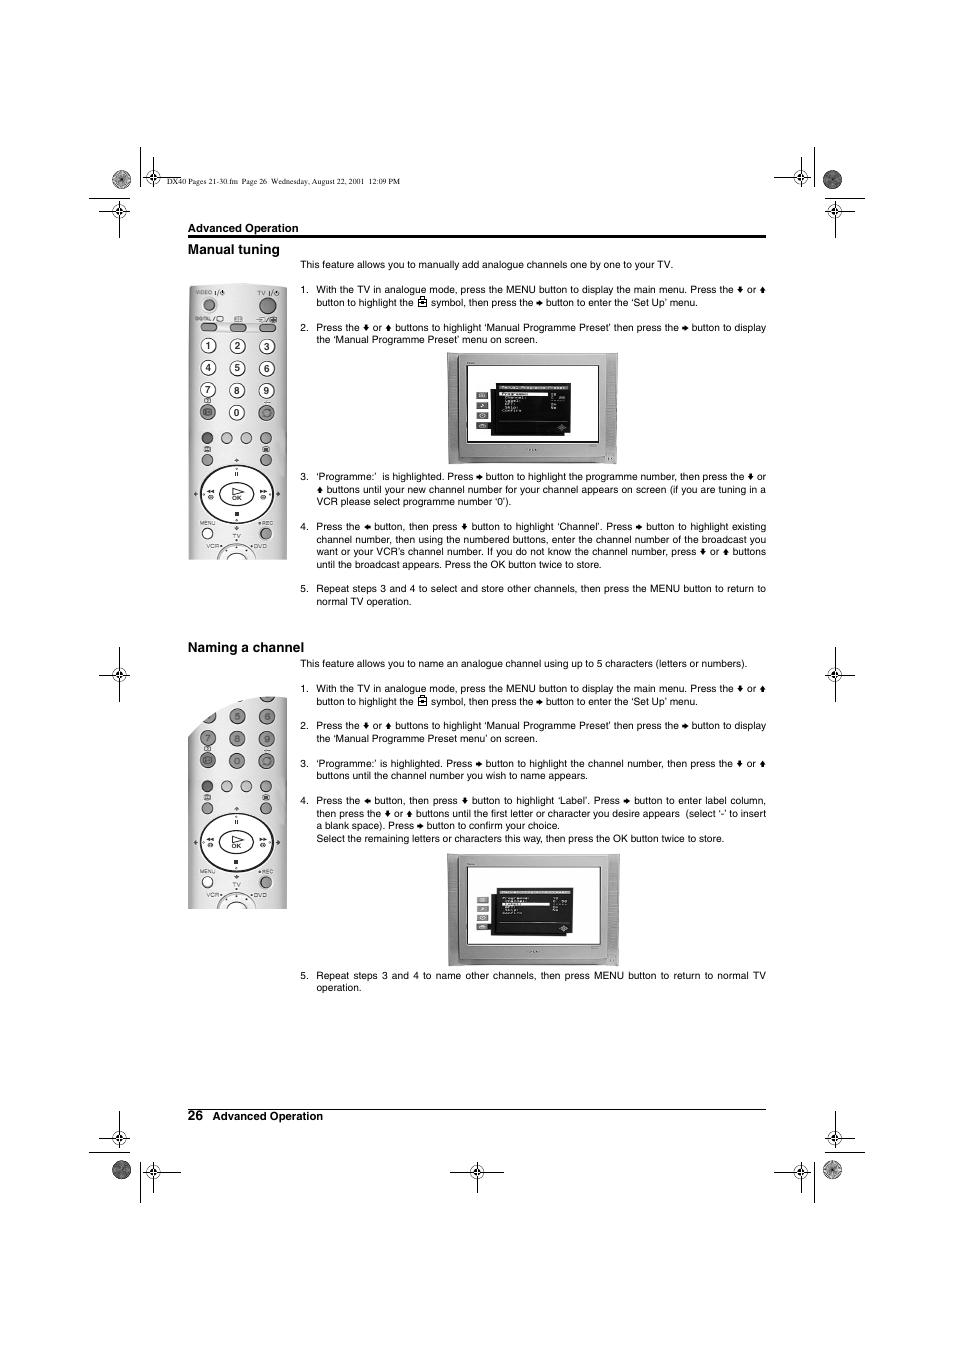 Manual tuning, Naming a channel | Sony Trinitron KD-32DX40U